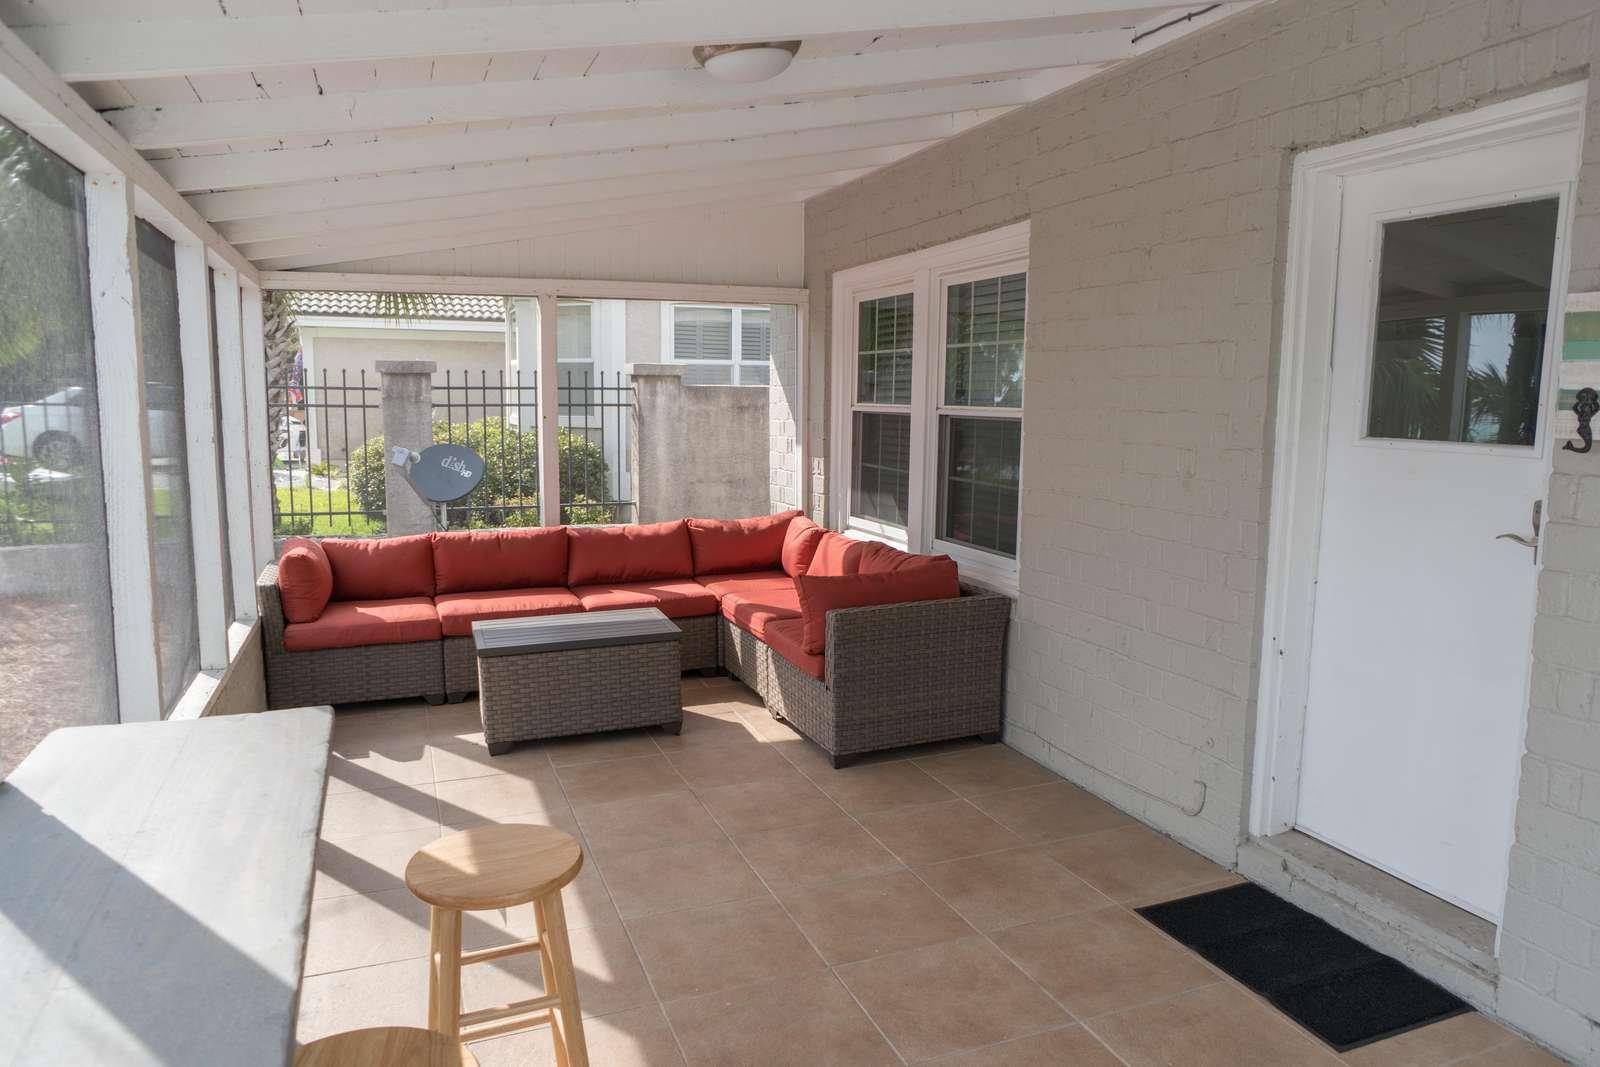 Sunroom/ Outdoor sitting area